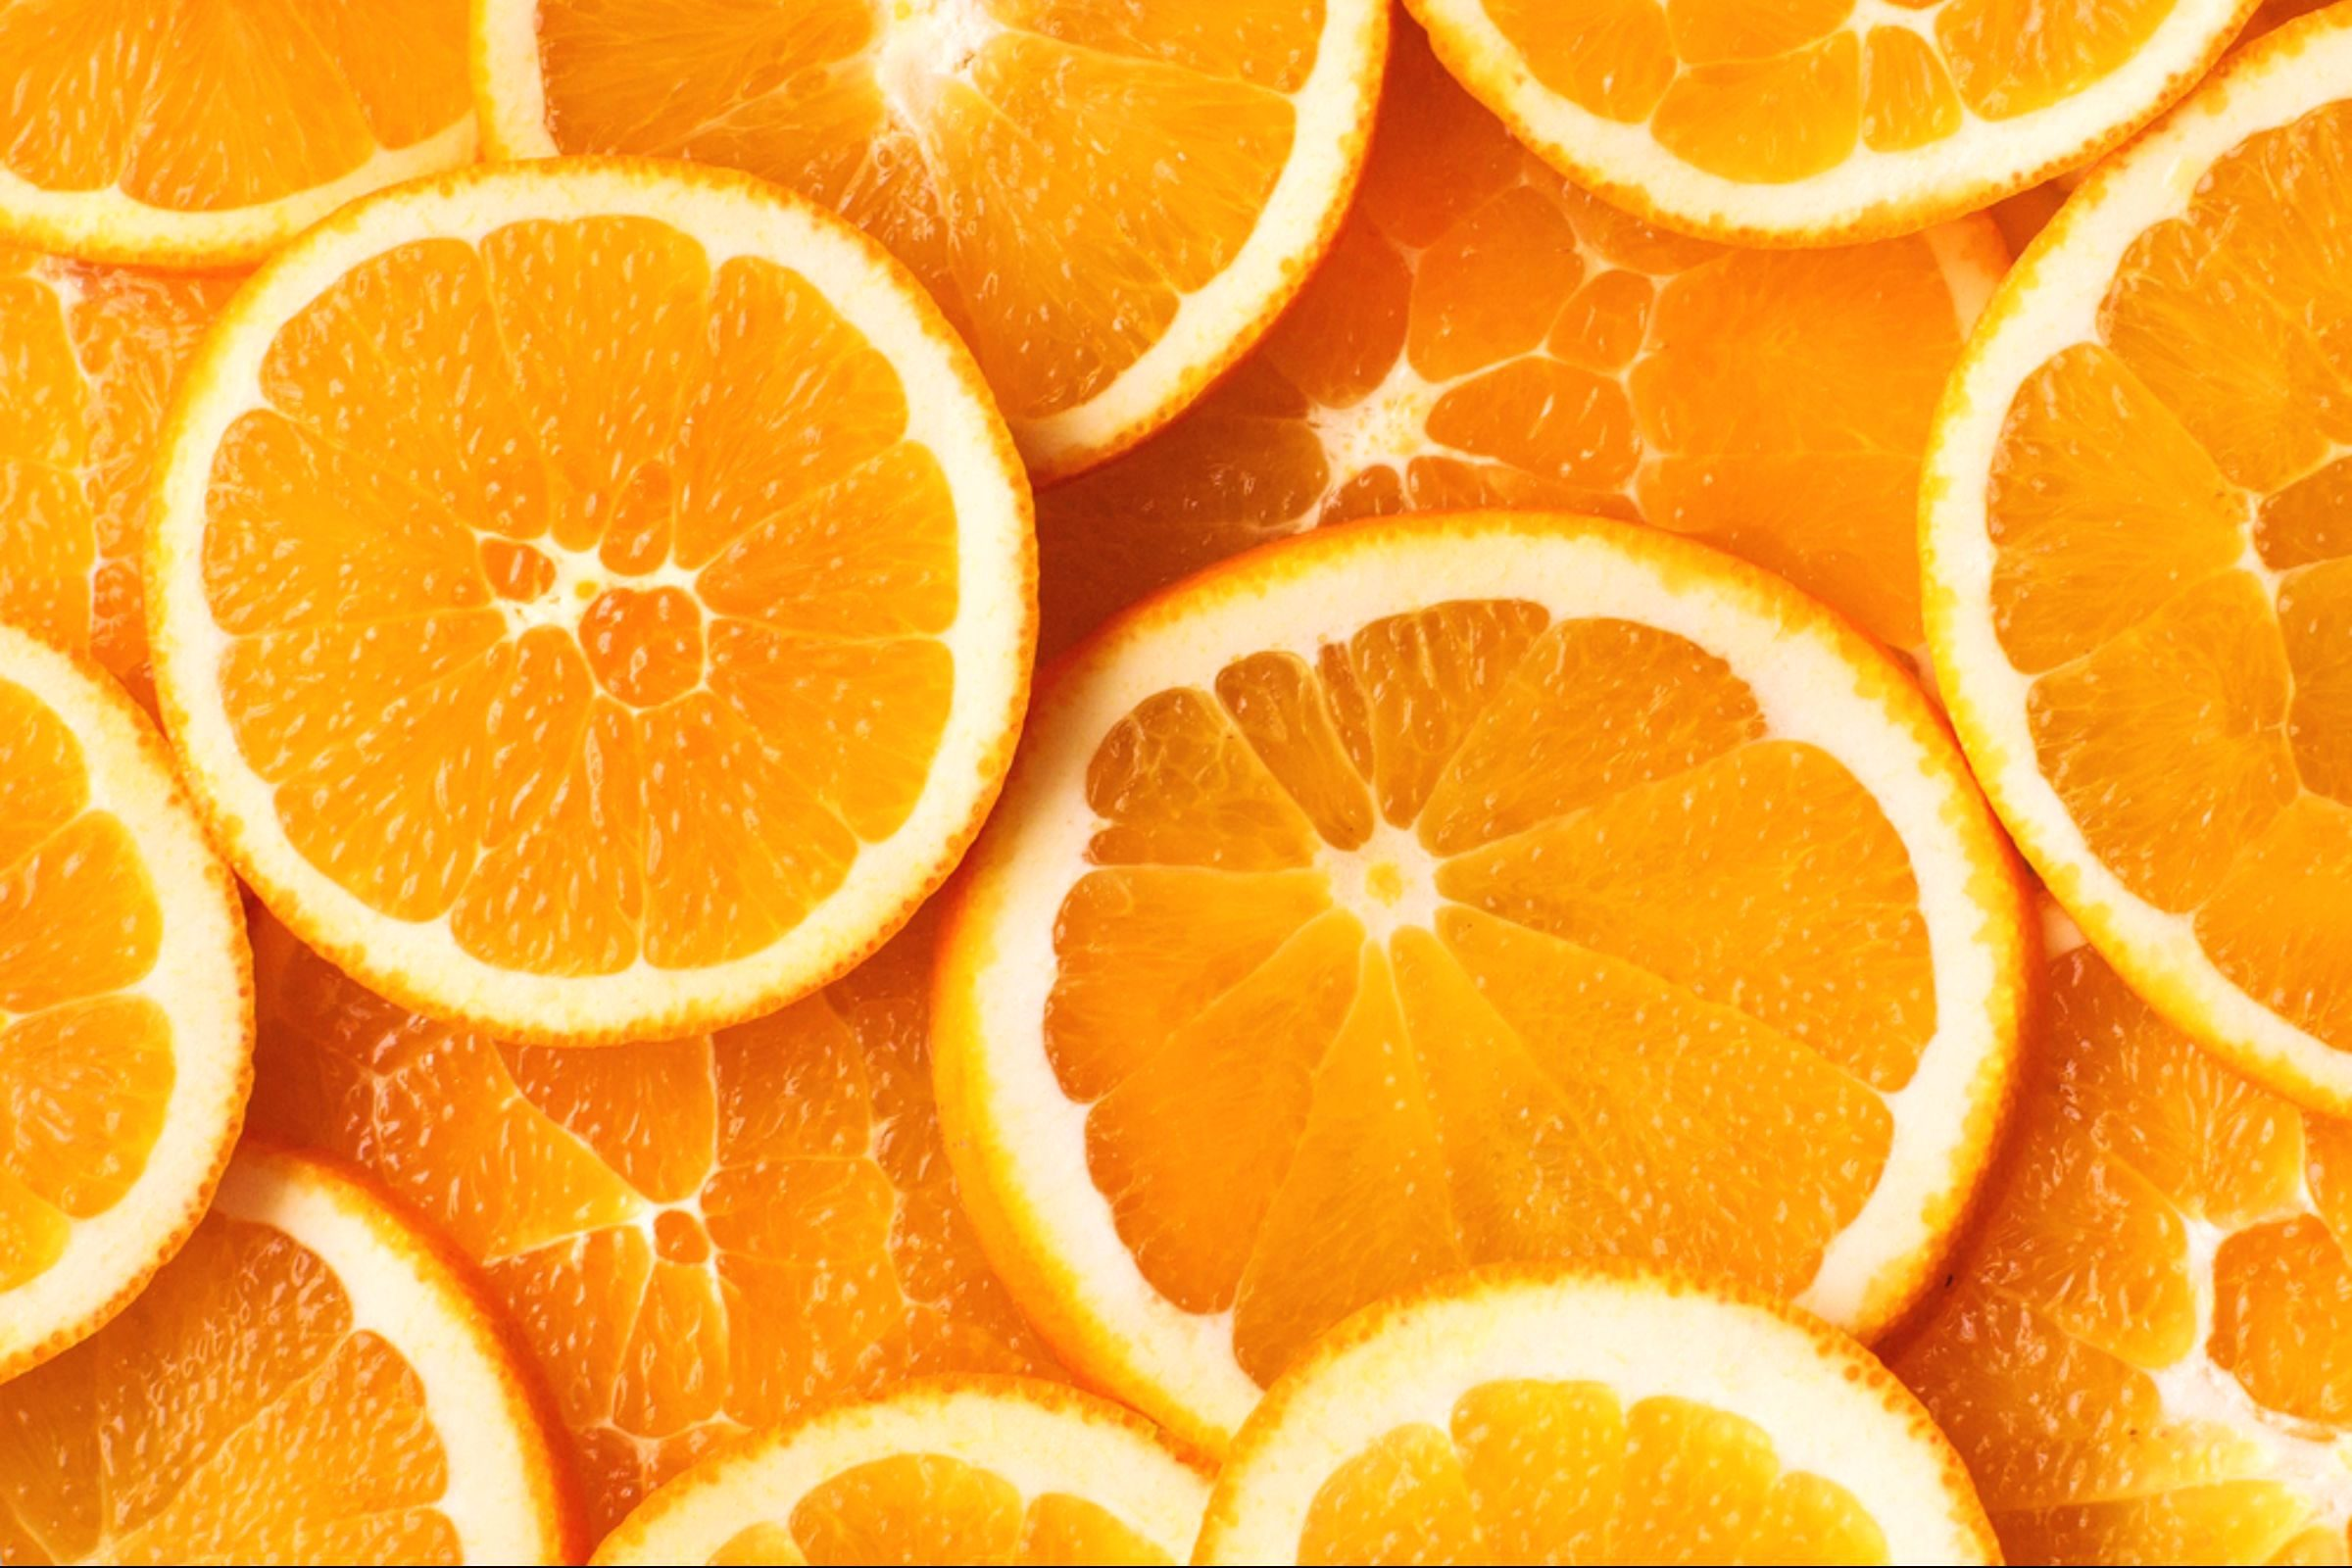 colourful foods | orange